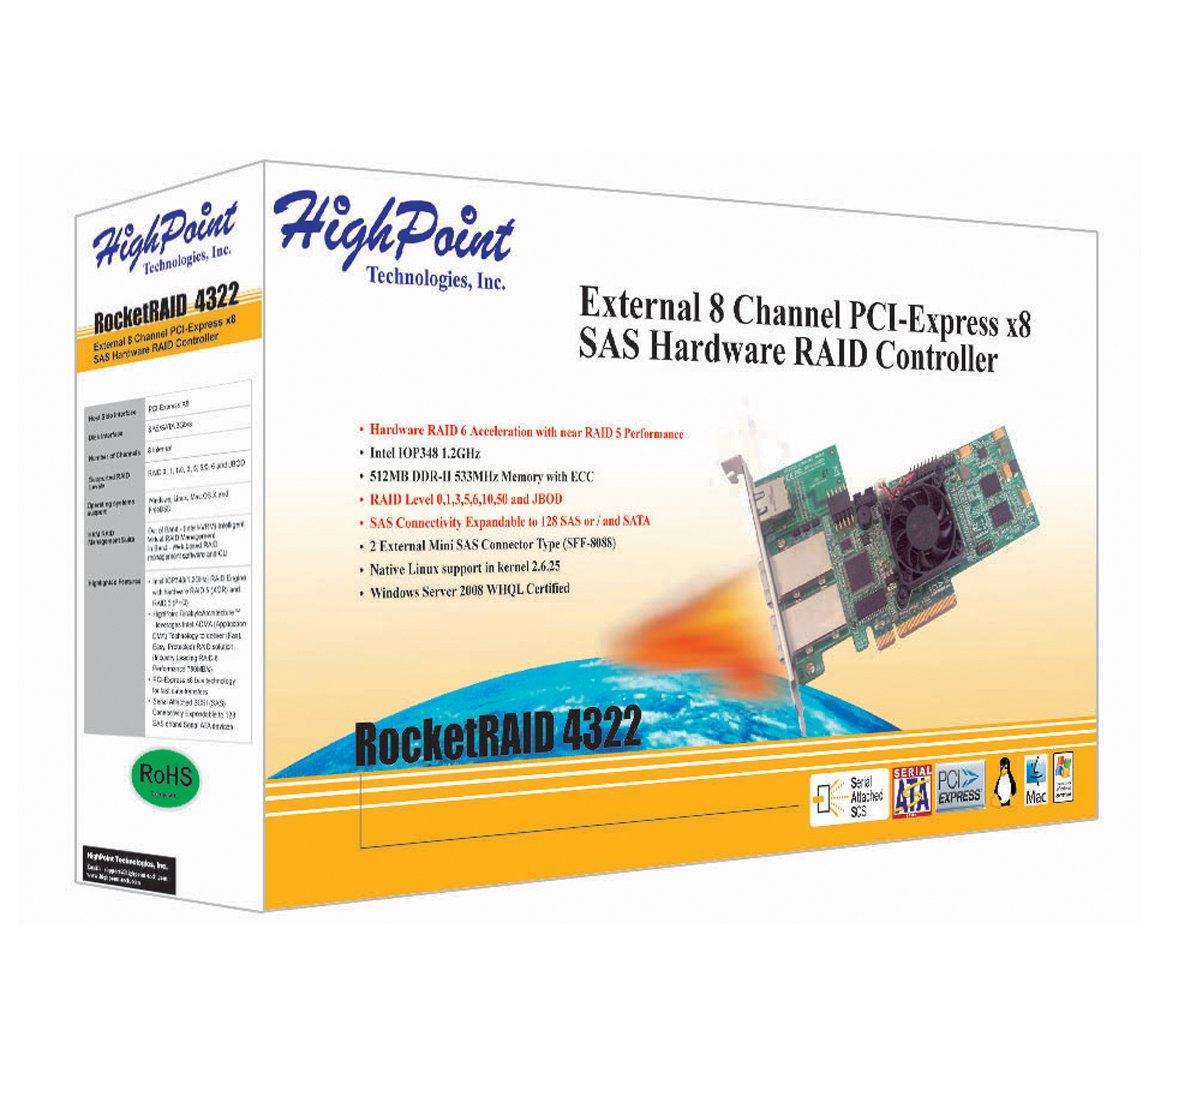 Highpoint Rocketraid 4322 8 Channel Pci Express X8 Sas Raid Jbod Wiring Diagram Controller Electronics